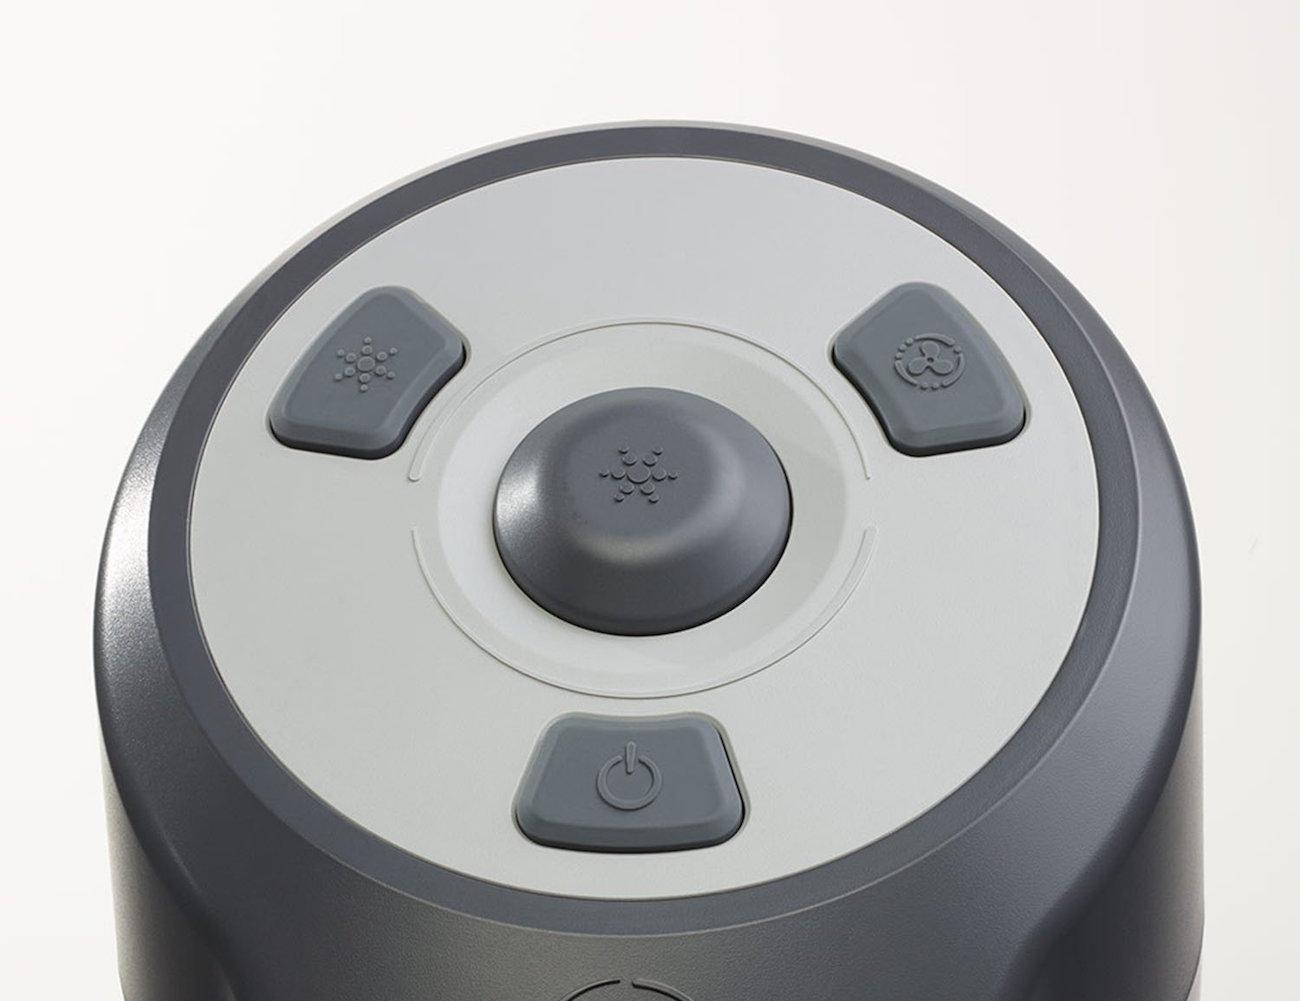 culer-3-speed-double-port-space-cooler-05